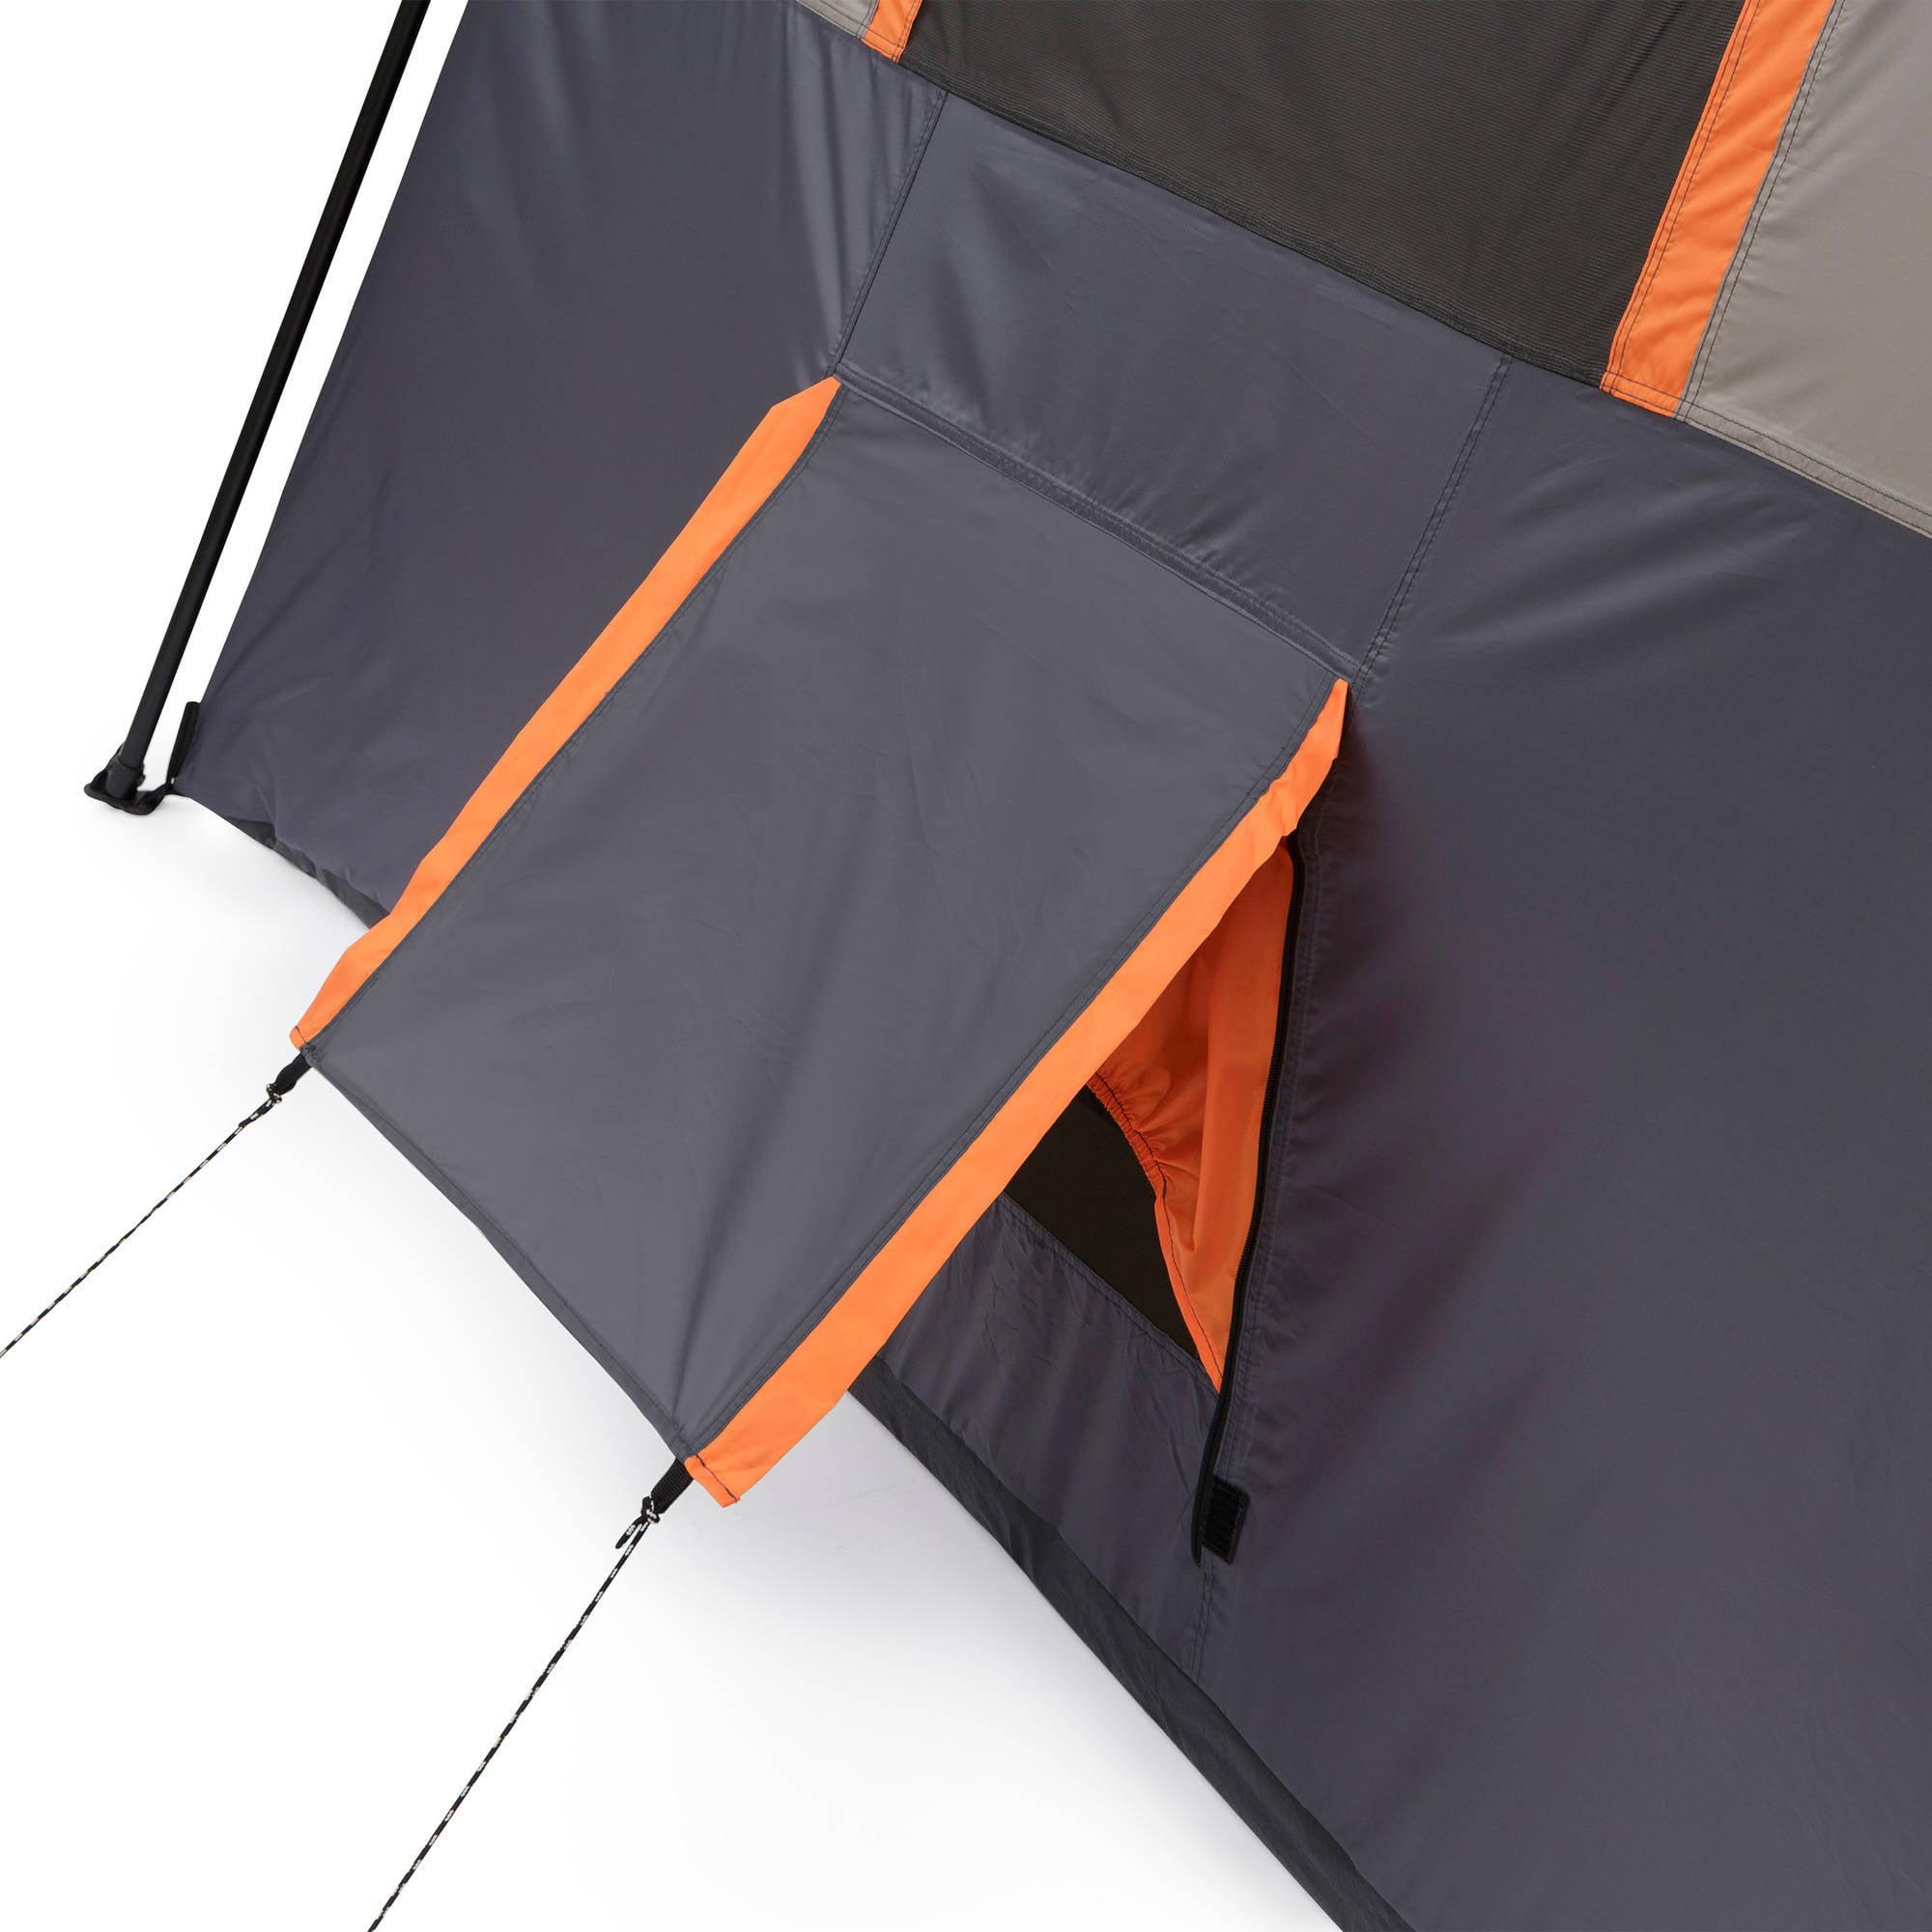 Ozark Trail Instant 20u0027 x 10u0027 Cabin C&ing Tent Sleeps 12 - Walmart.com  sc 1 st  Walmart.com & Ozark Trail Instant 20u0027 x 10u0027 Cabin Camping Tent Sleeps 12 ...